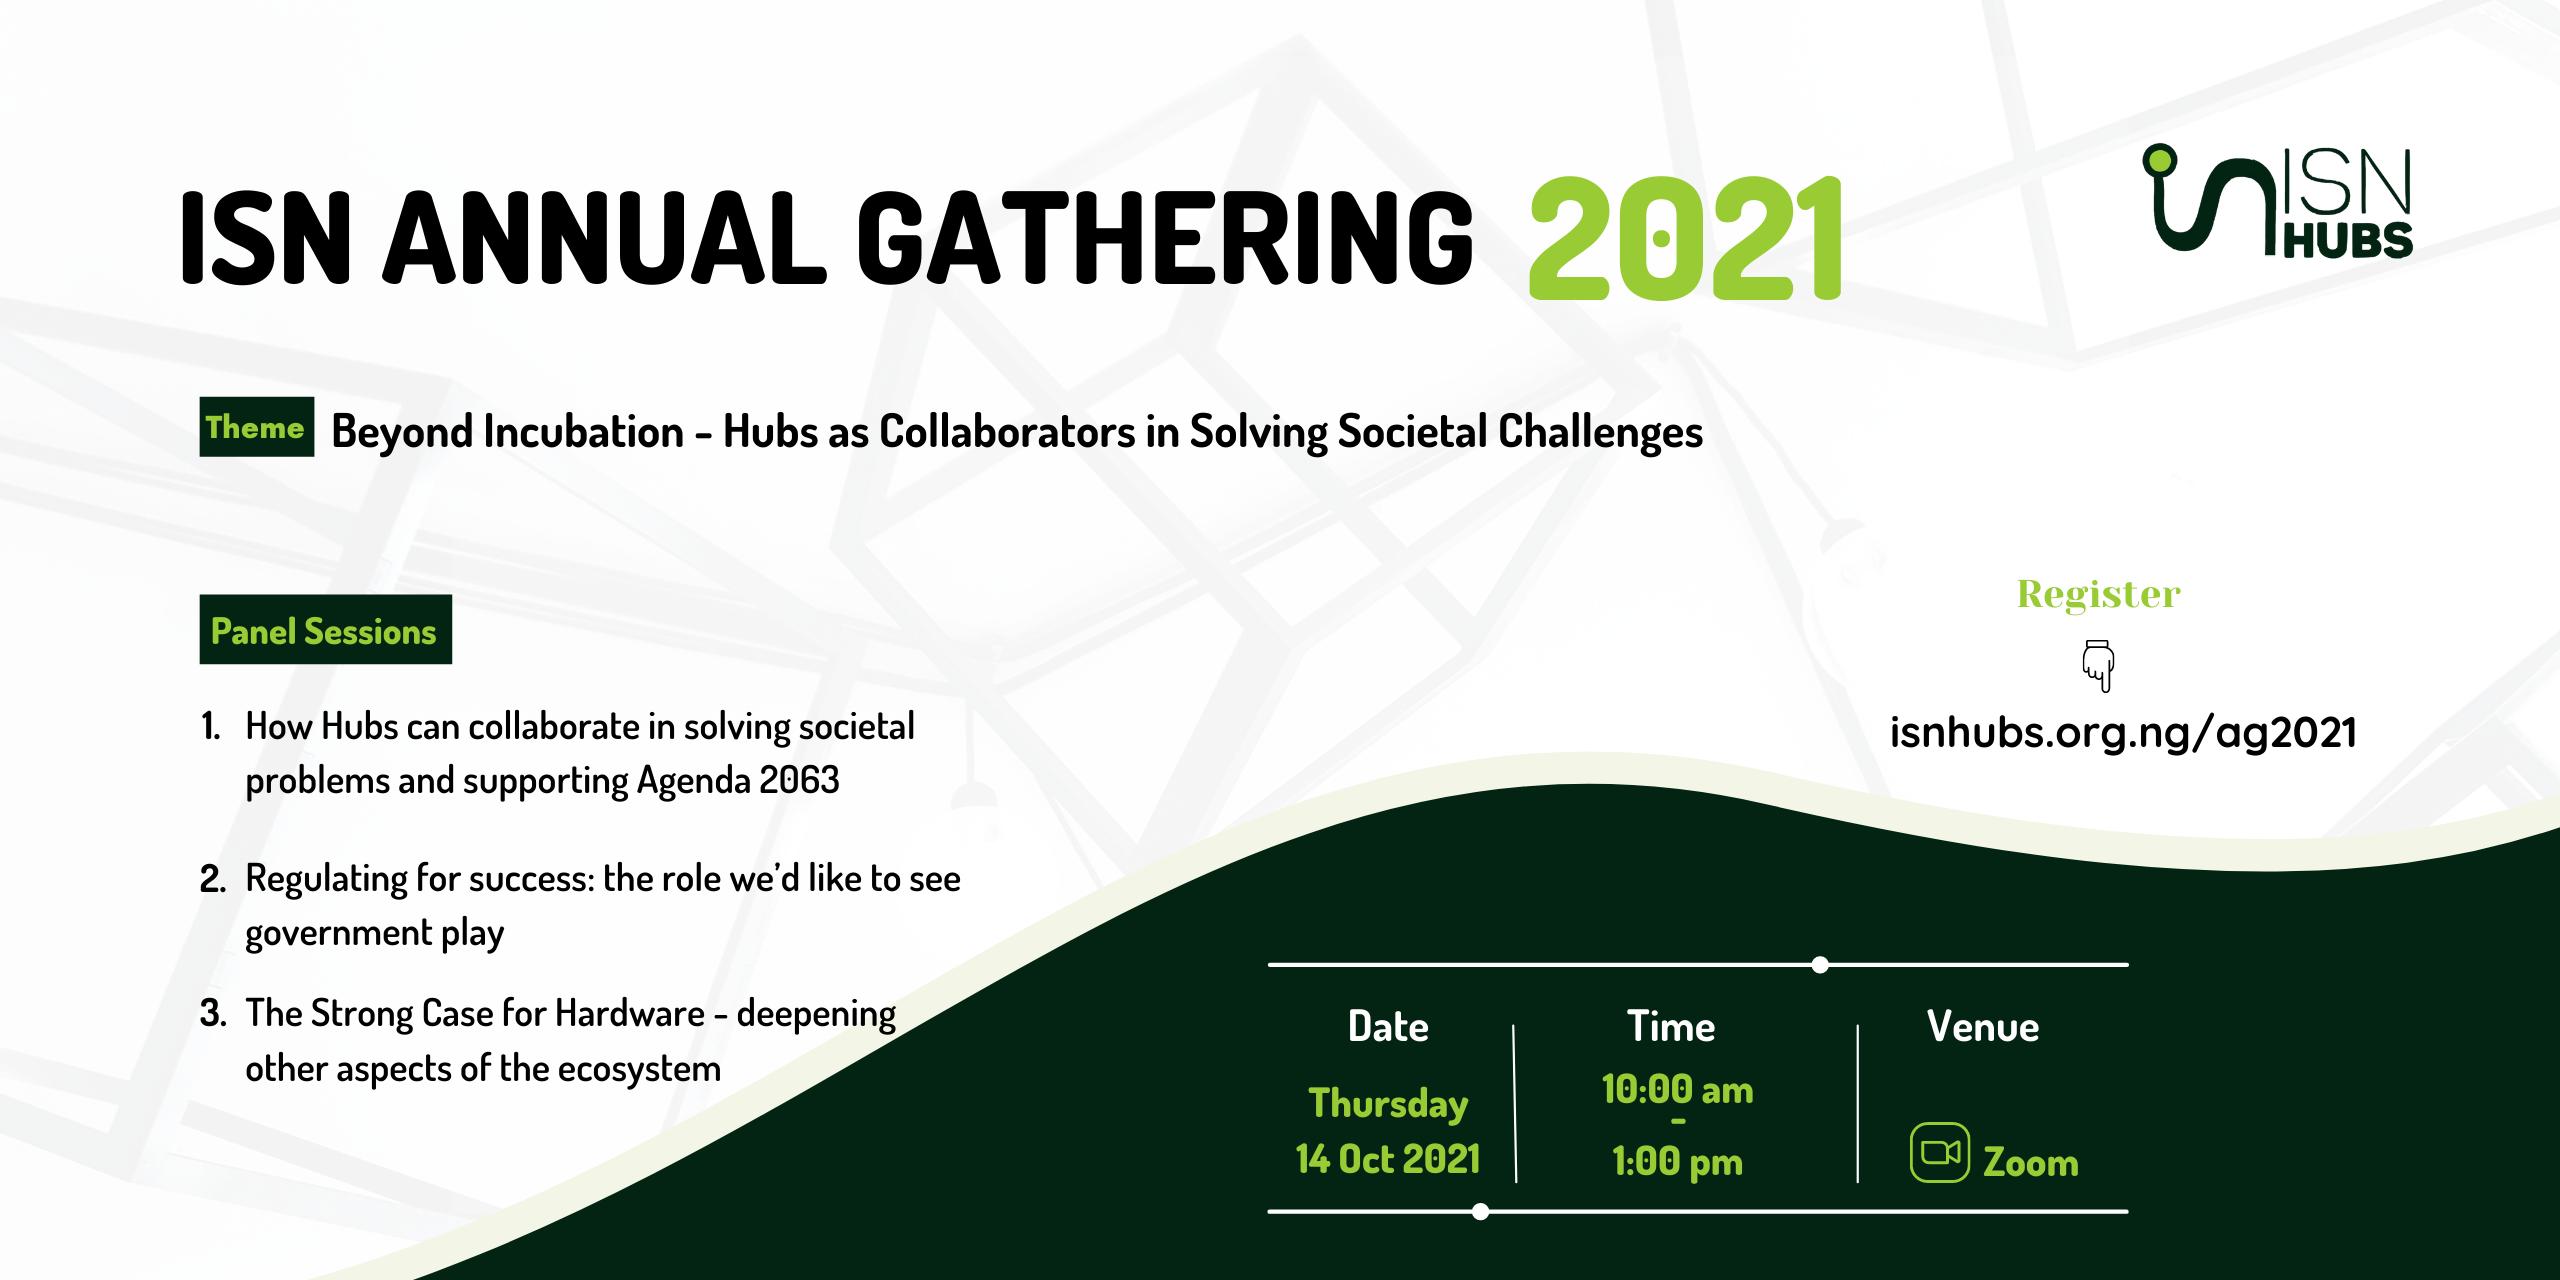 Annual Gathering Event 2021 - isnhubs